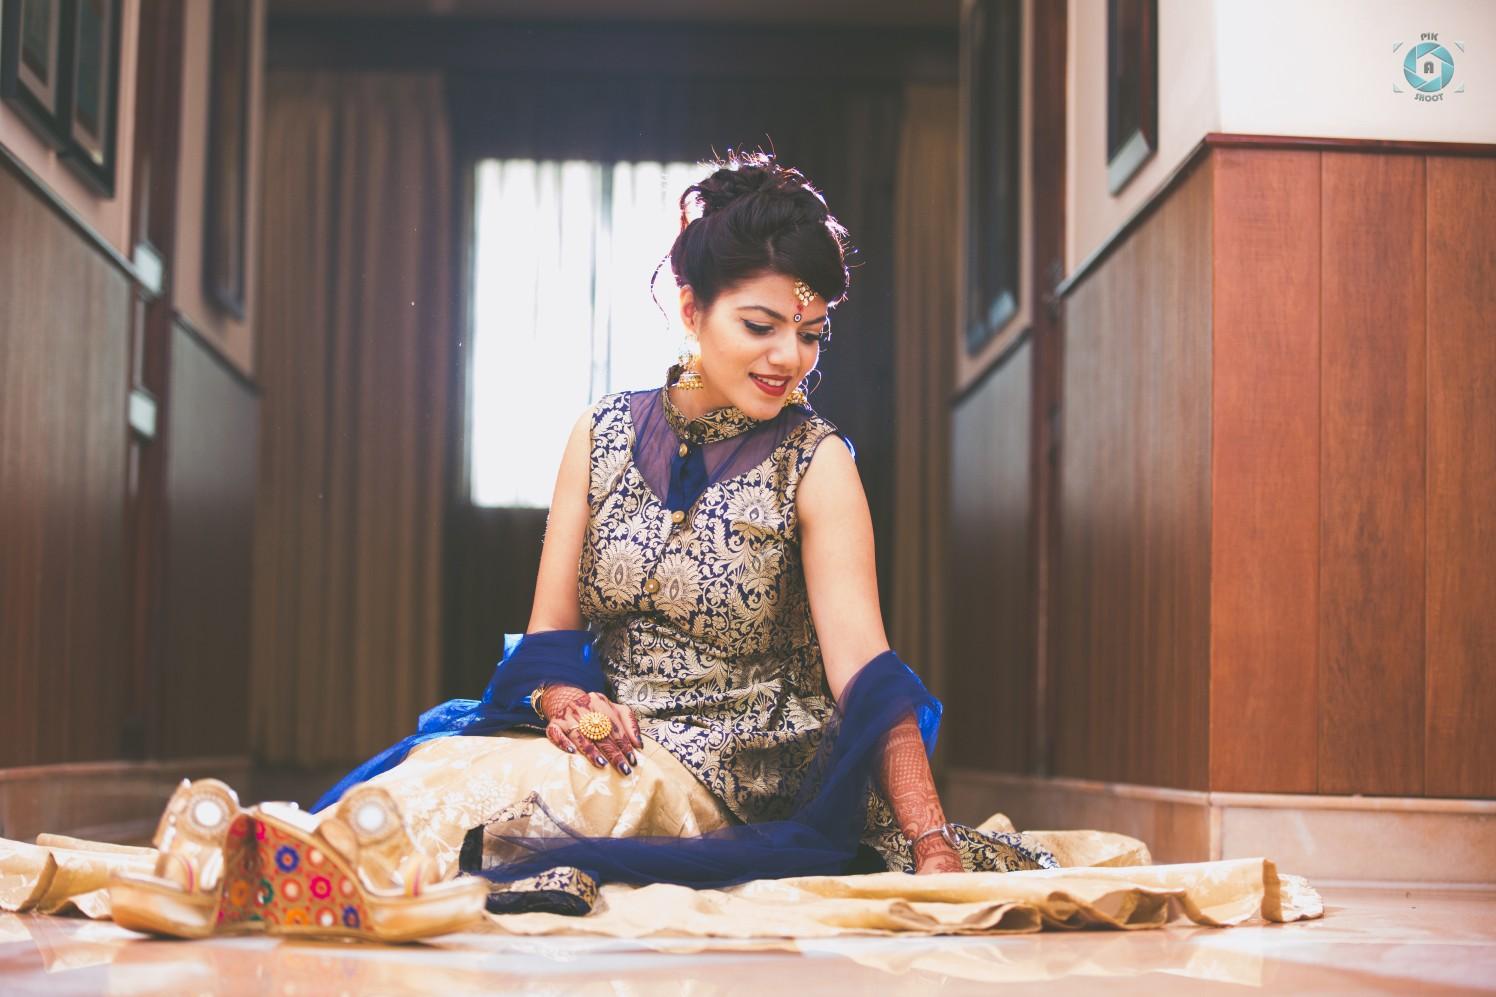 Charming Bridal Portrait by Anant Mishra Wedding-photography | Weddings Photos & Ideas